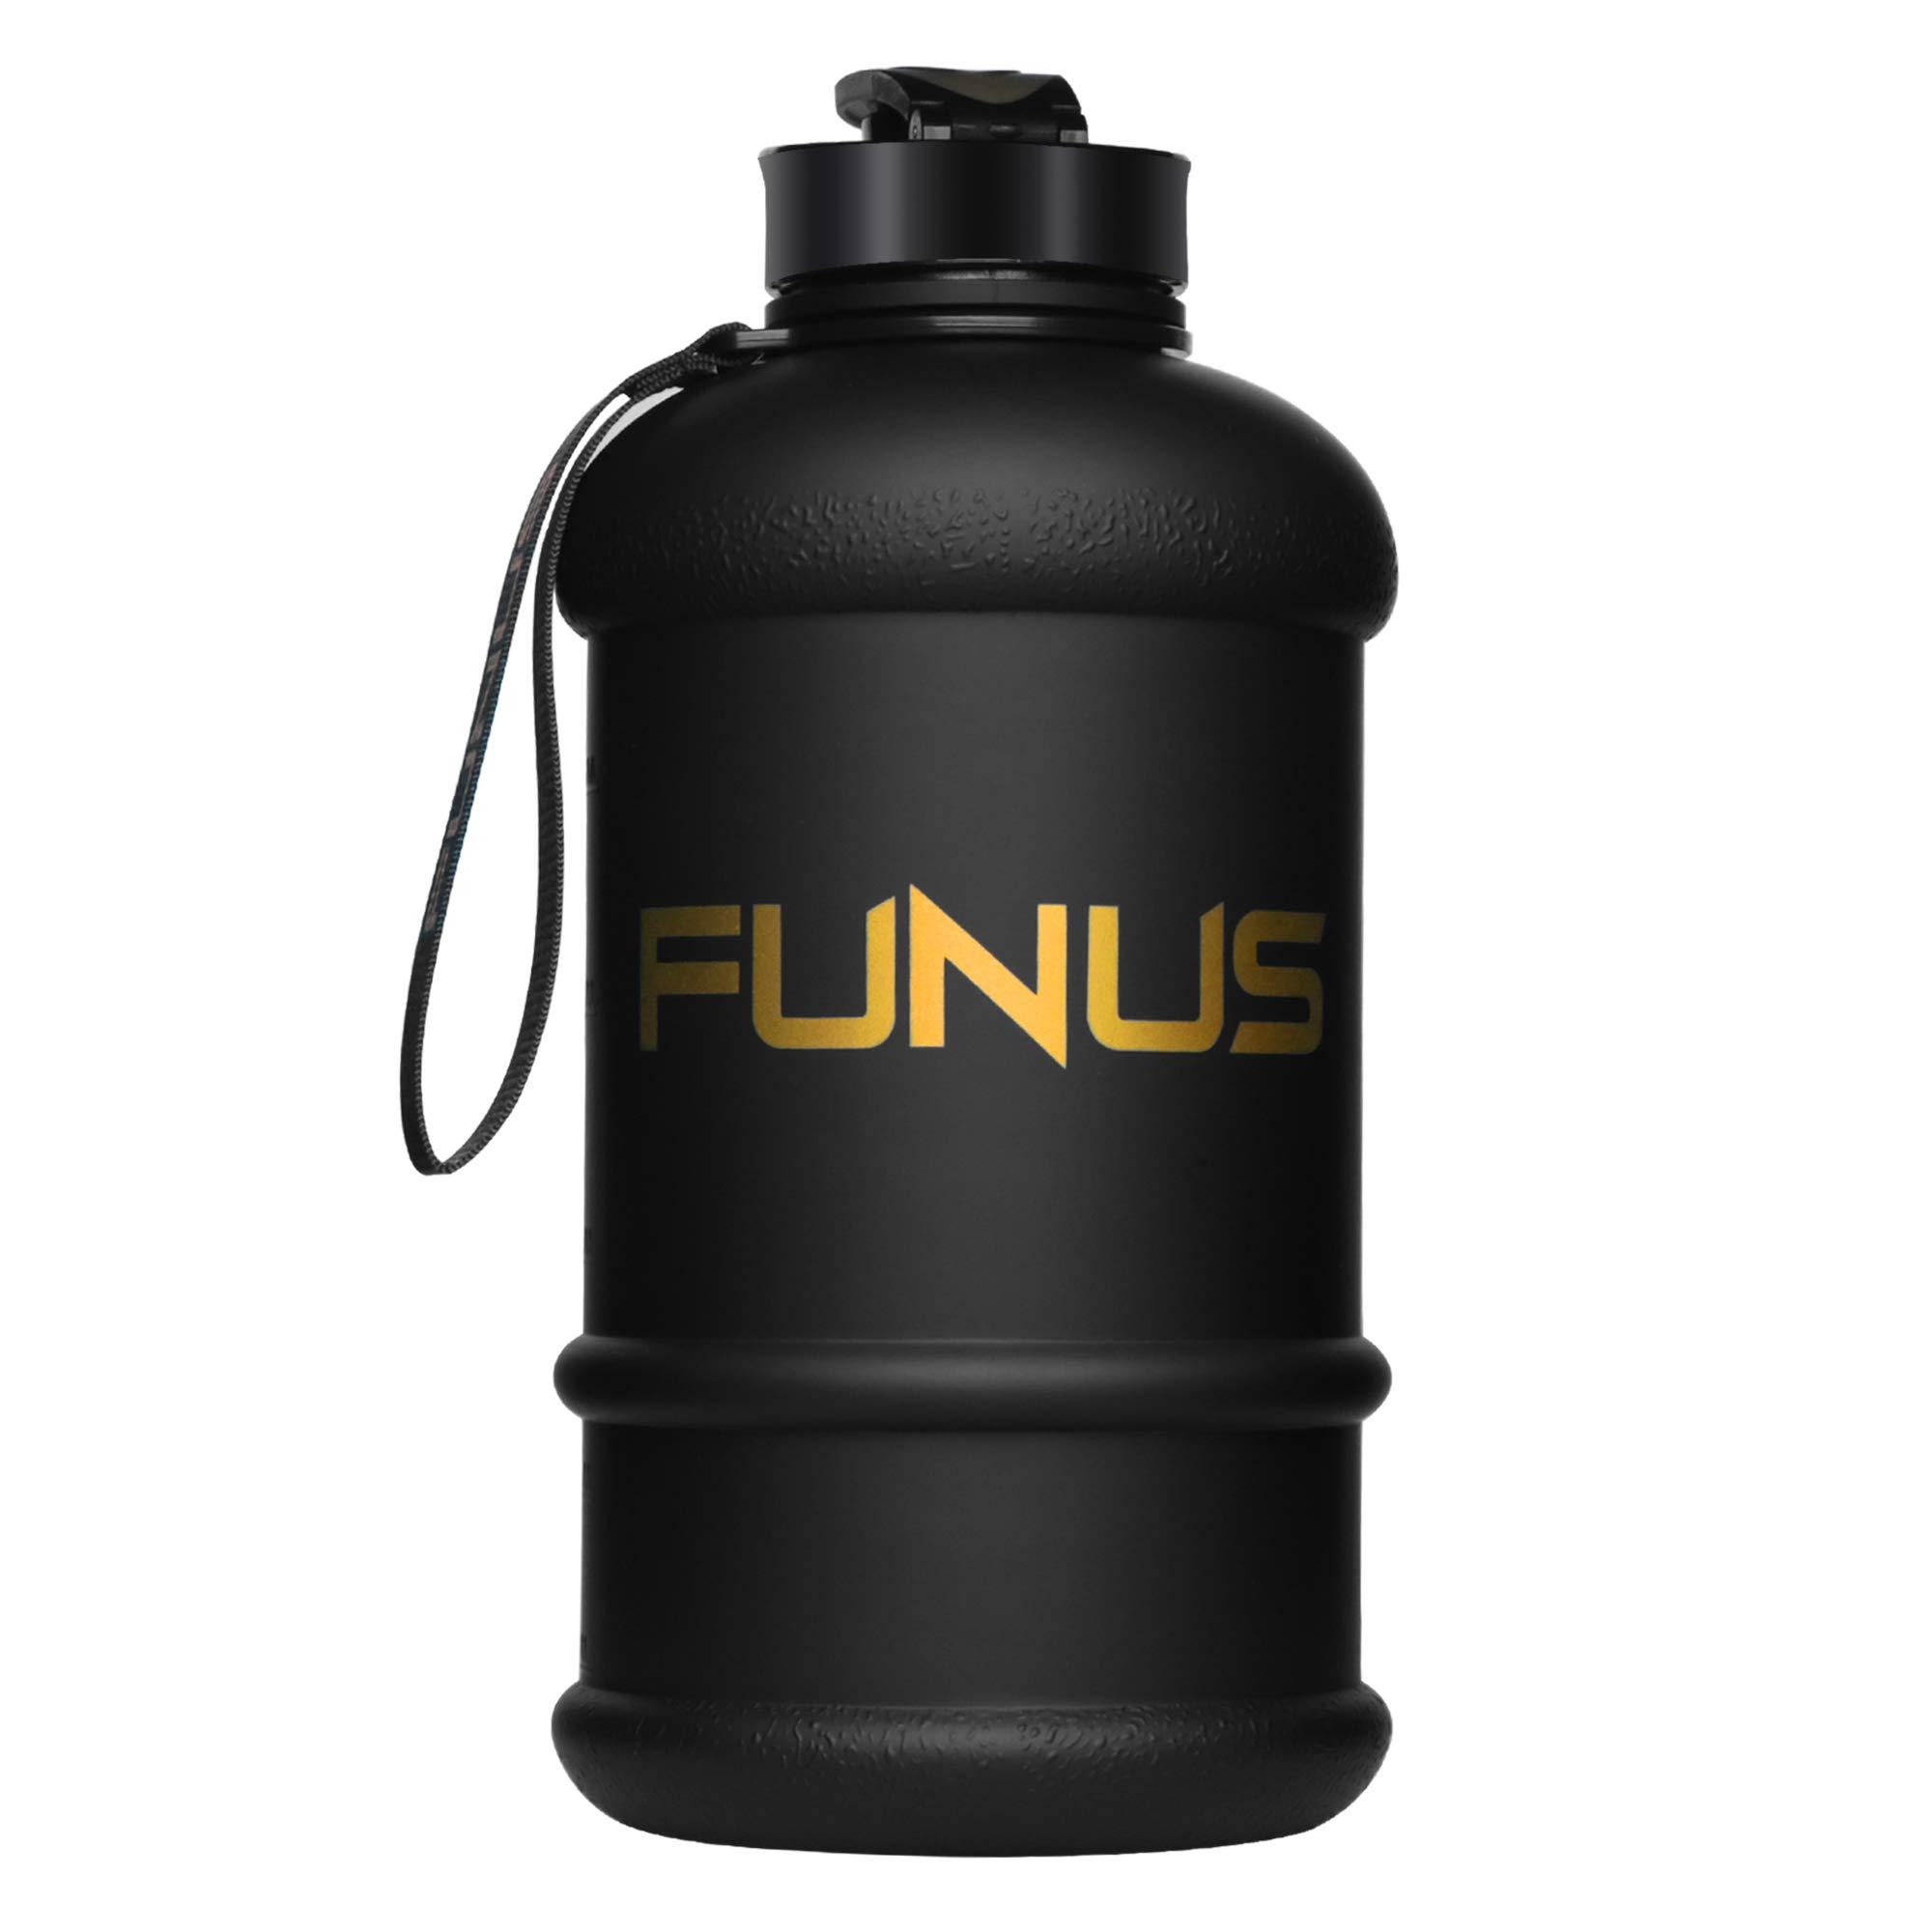 FUNUS Big Water Bottle 1.3L-2.2L Odorless Water Jug BPA Free Leak Proof Reusable Big Capacity for Men Women Fitness Gym Outdoor Climbing (1.3L Matte Black) by FUNUS